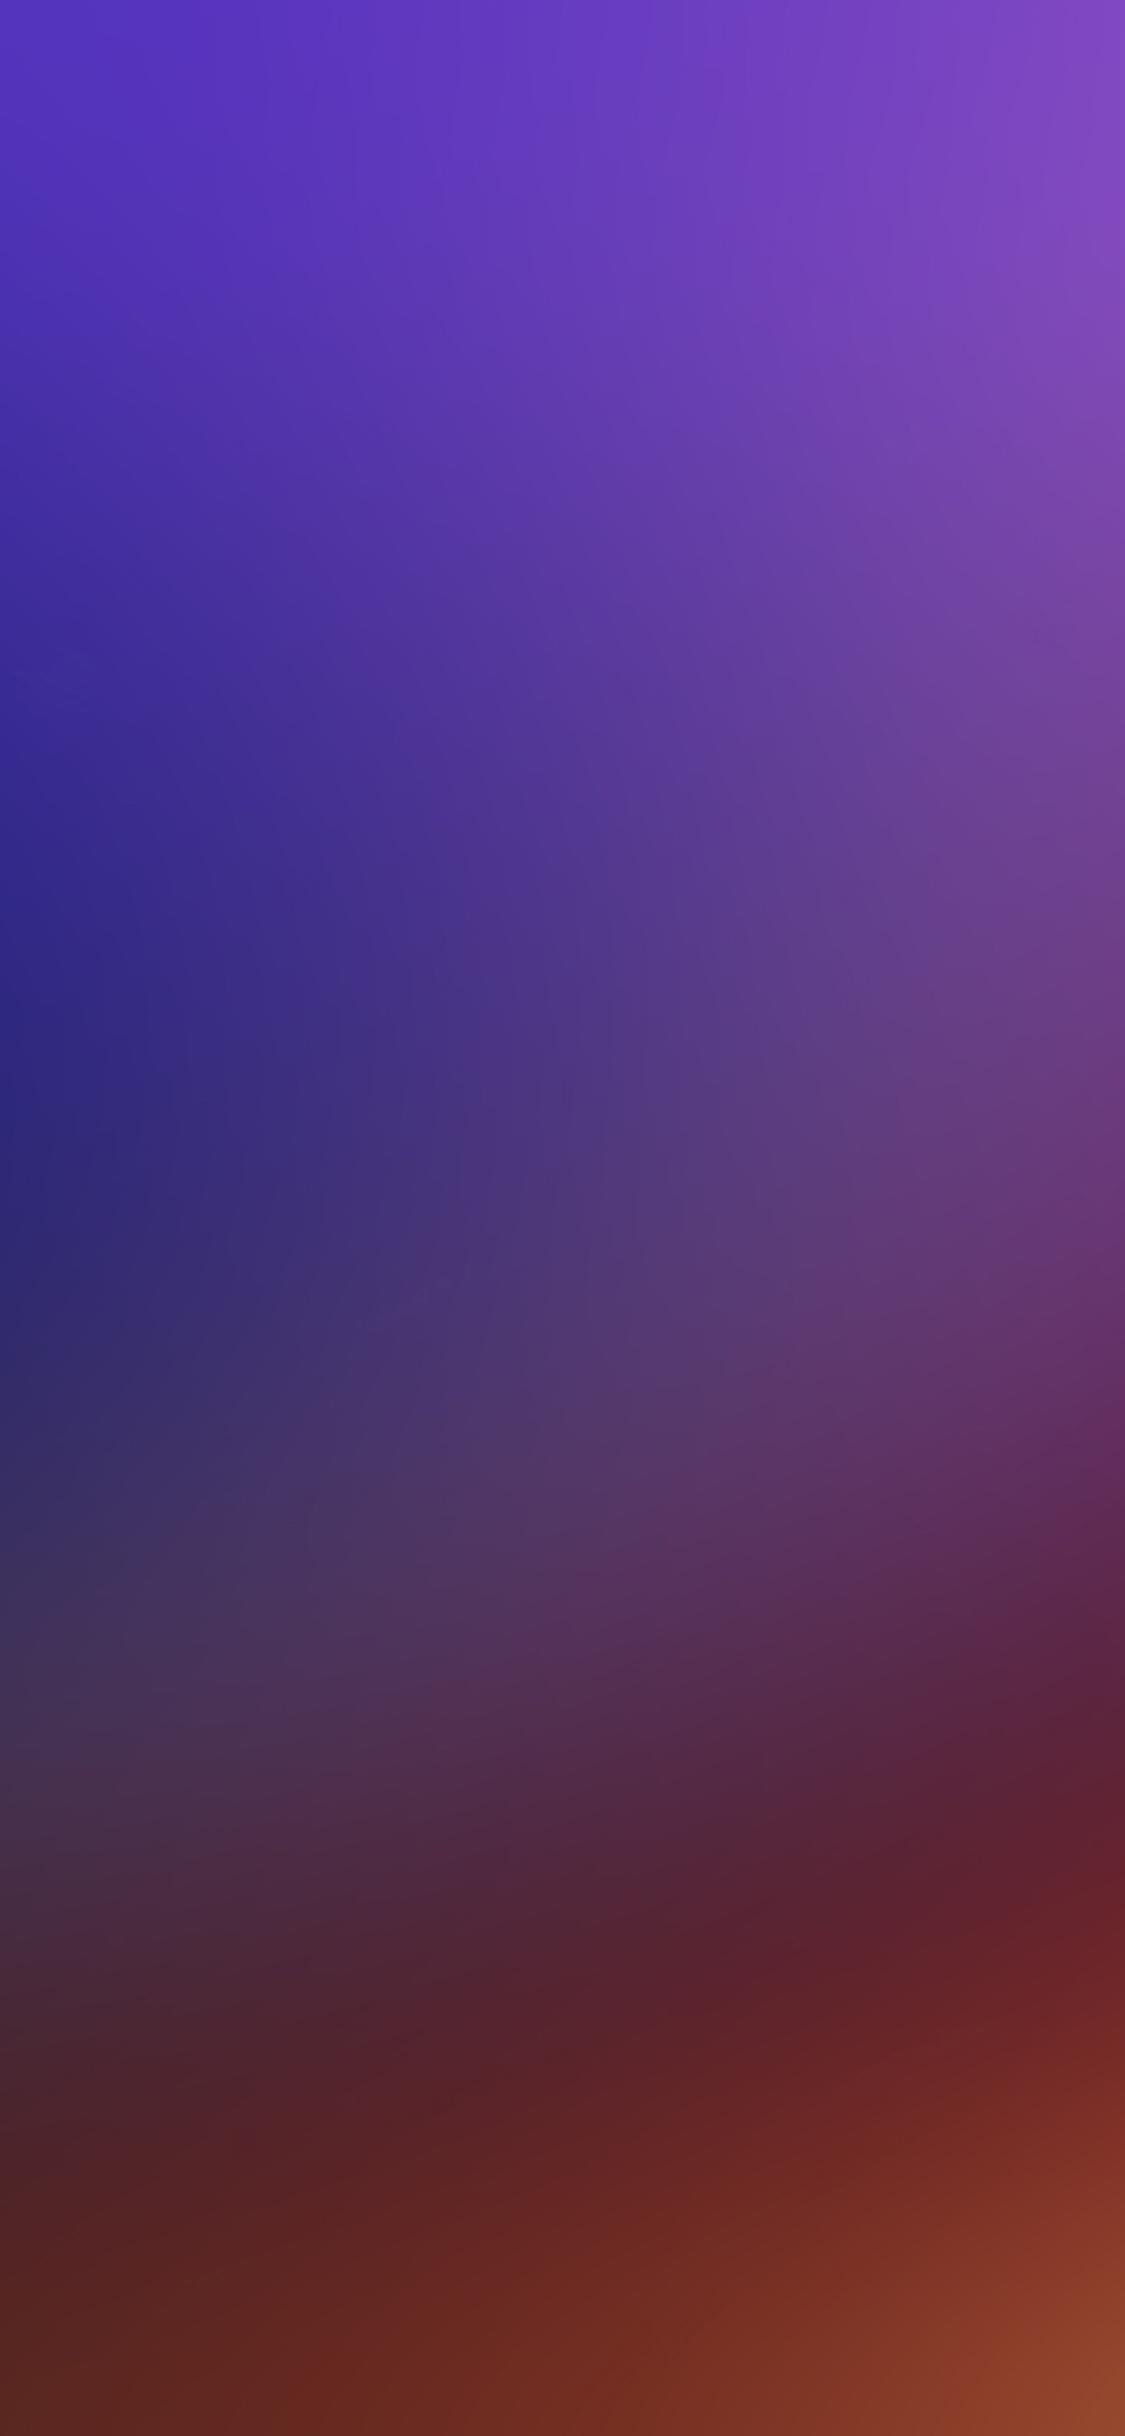 iPhoneXpapers.com-Apple-iPhone-wallpaper-se27-mtv-day-gradation-blur